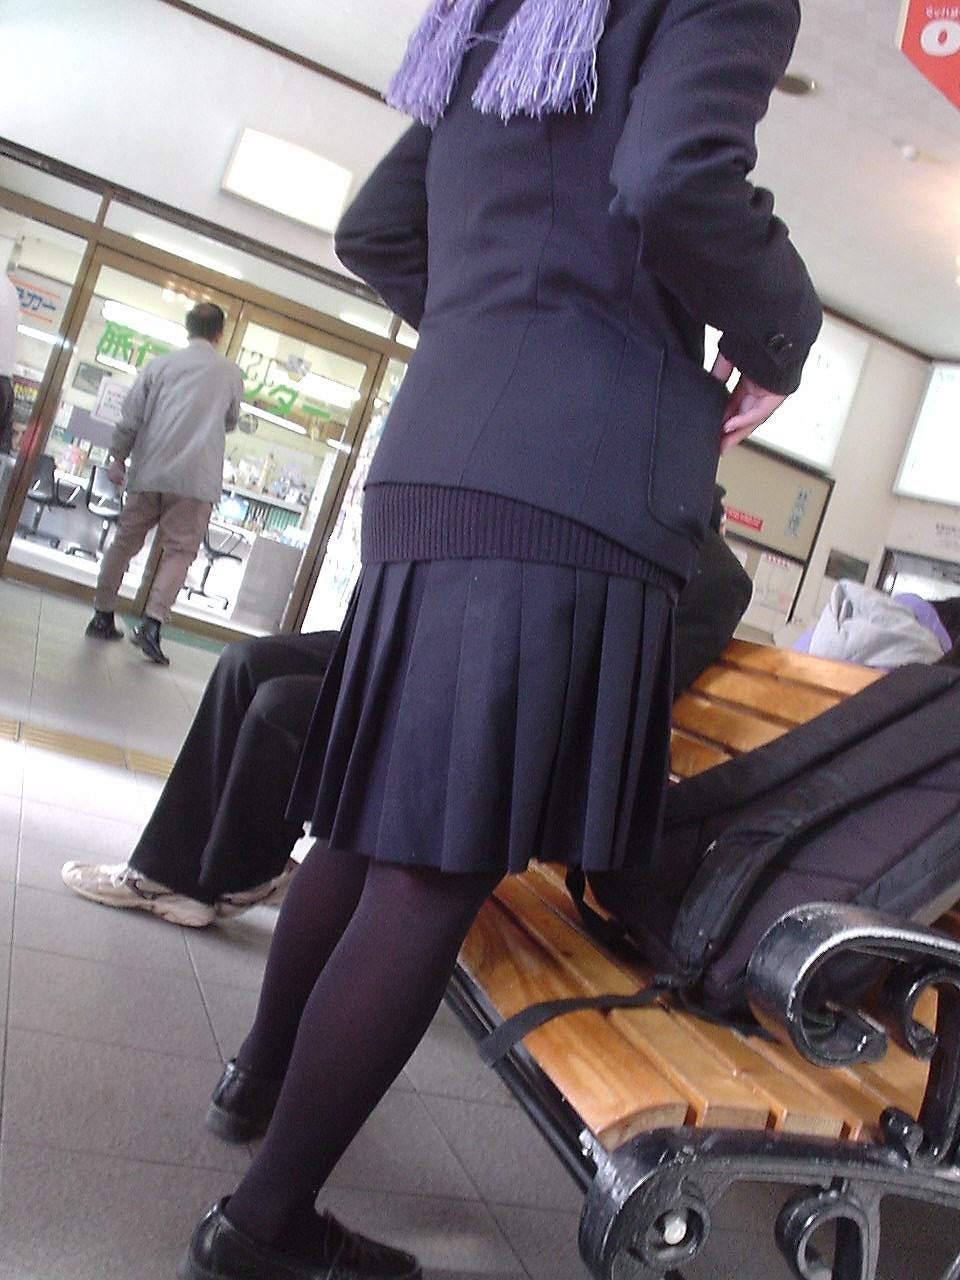 【JKフェチ画像】黒タイツ・黒スト着けたJKを見て冬を感じるwww 12